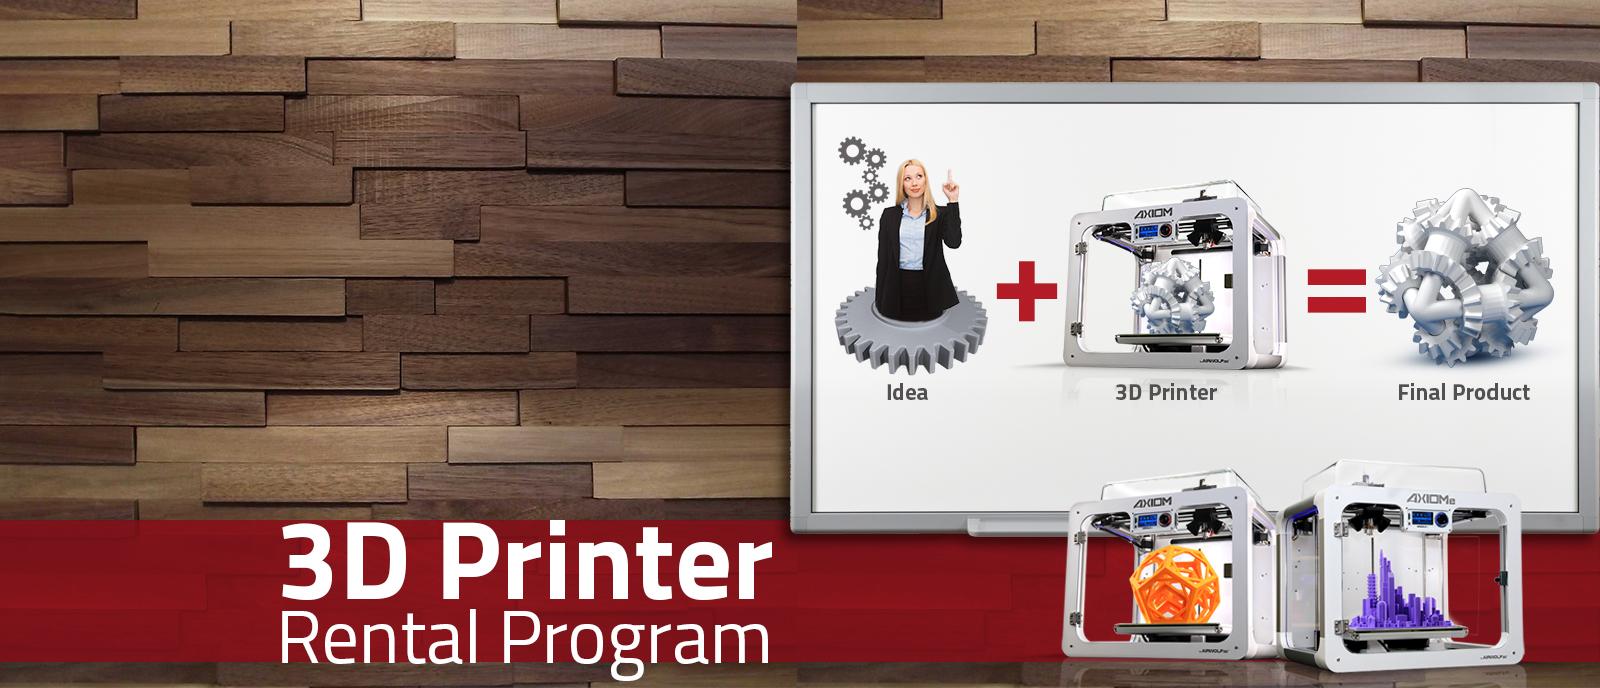 3D Printer Rental Program